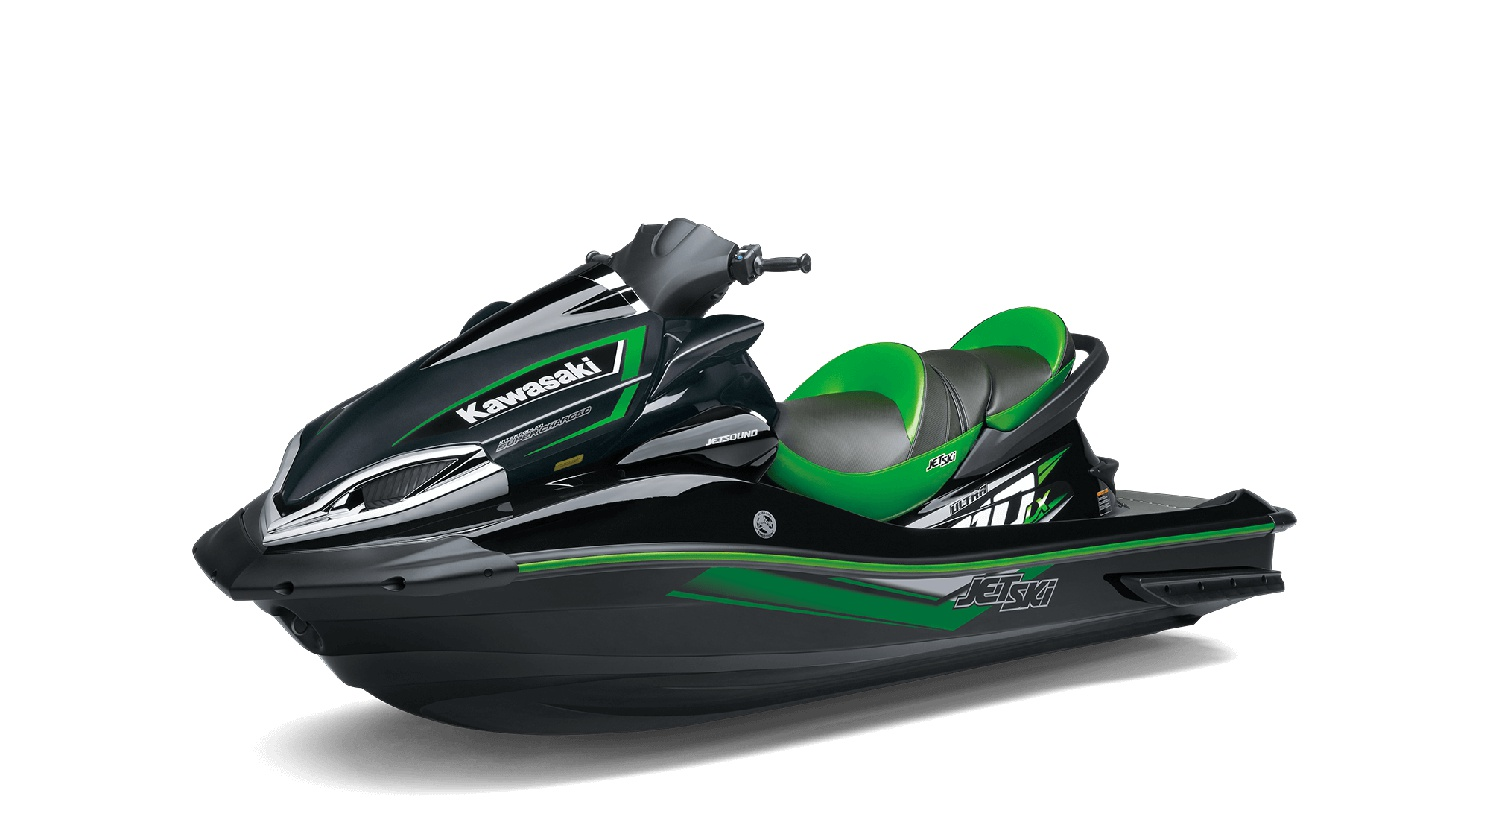 2020 Kawasaki JET SKI ULTRA 310LX Ebony/Metallic Carbon Gray